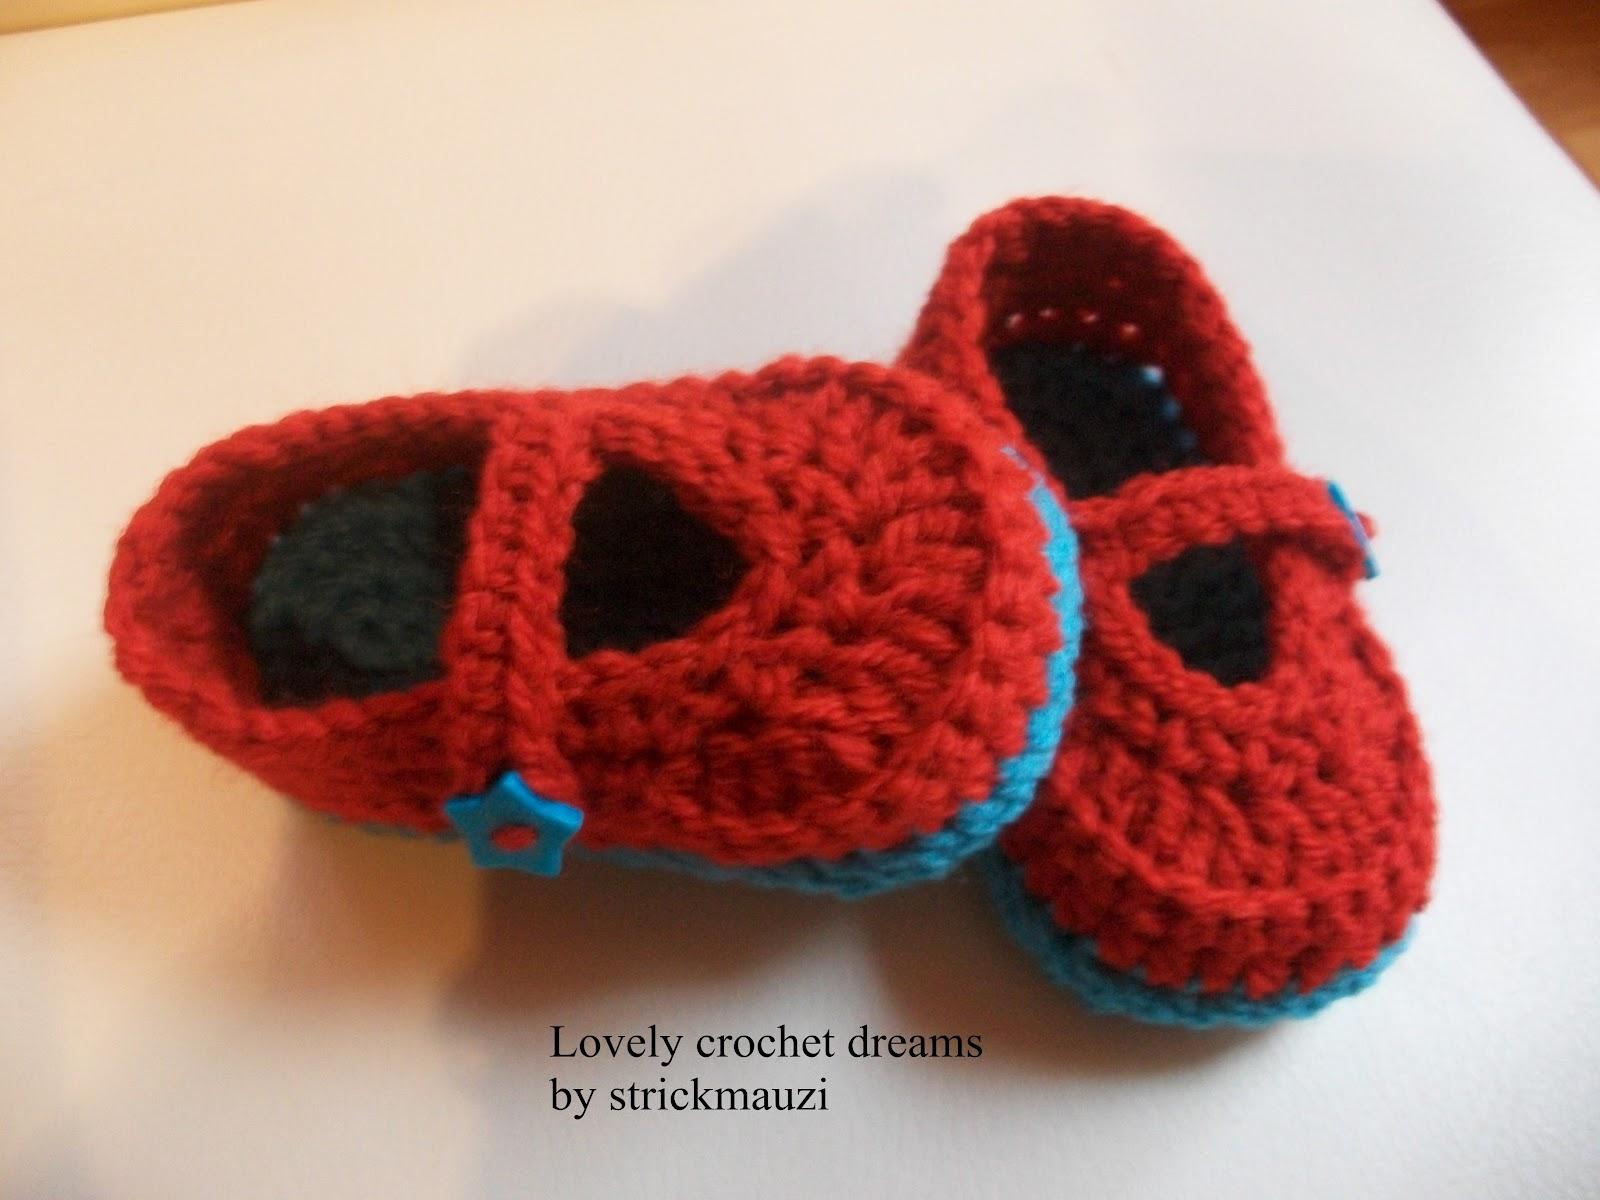 Lovely crochet dreams by strickmauzi: Anleitung Babyschuhe \'Vivian ...